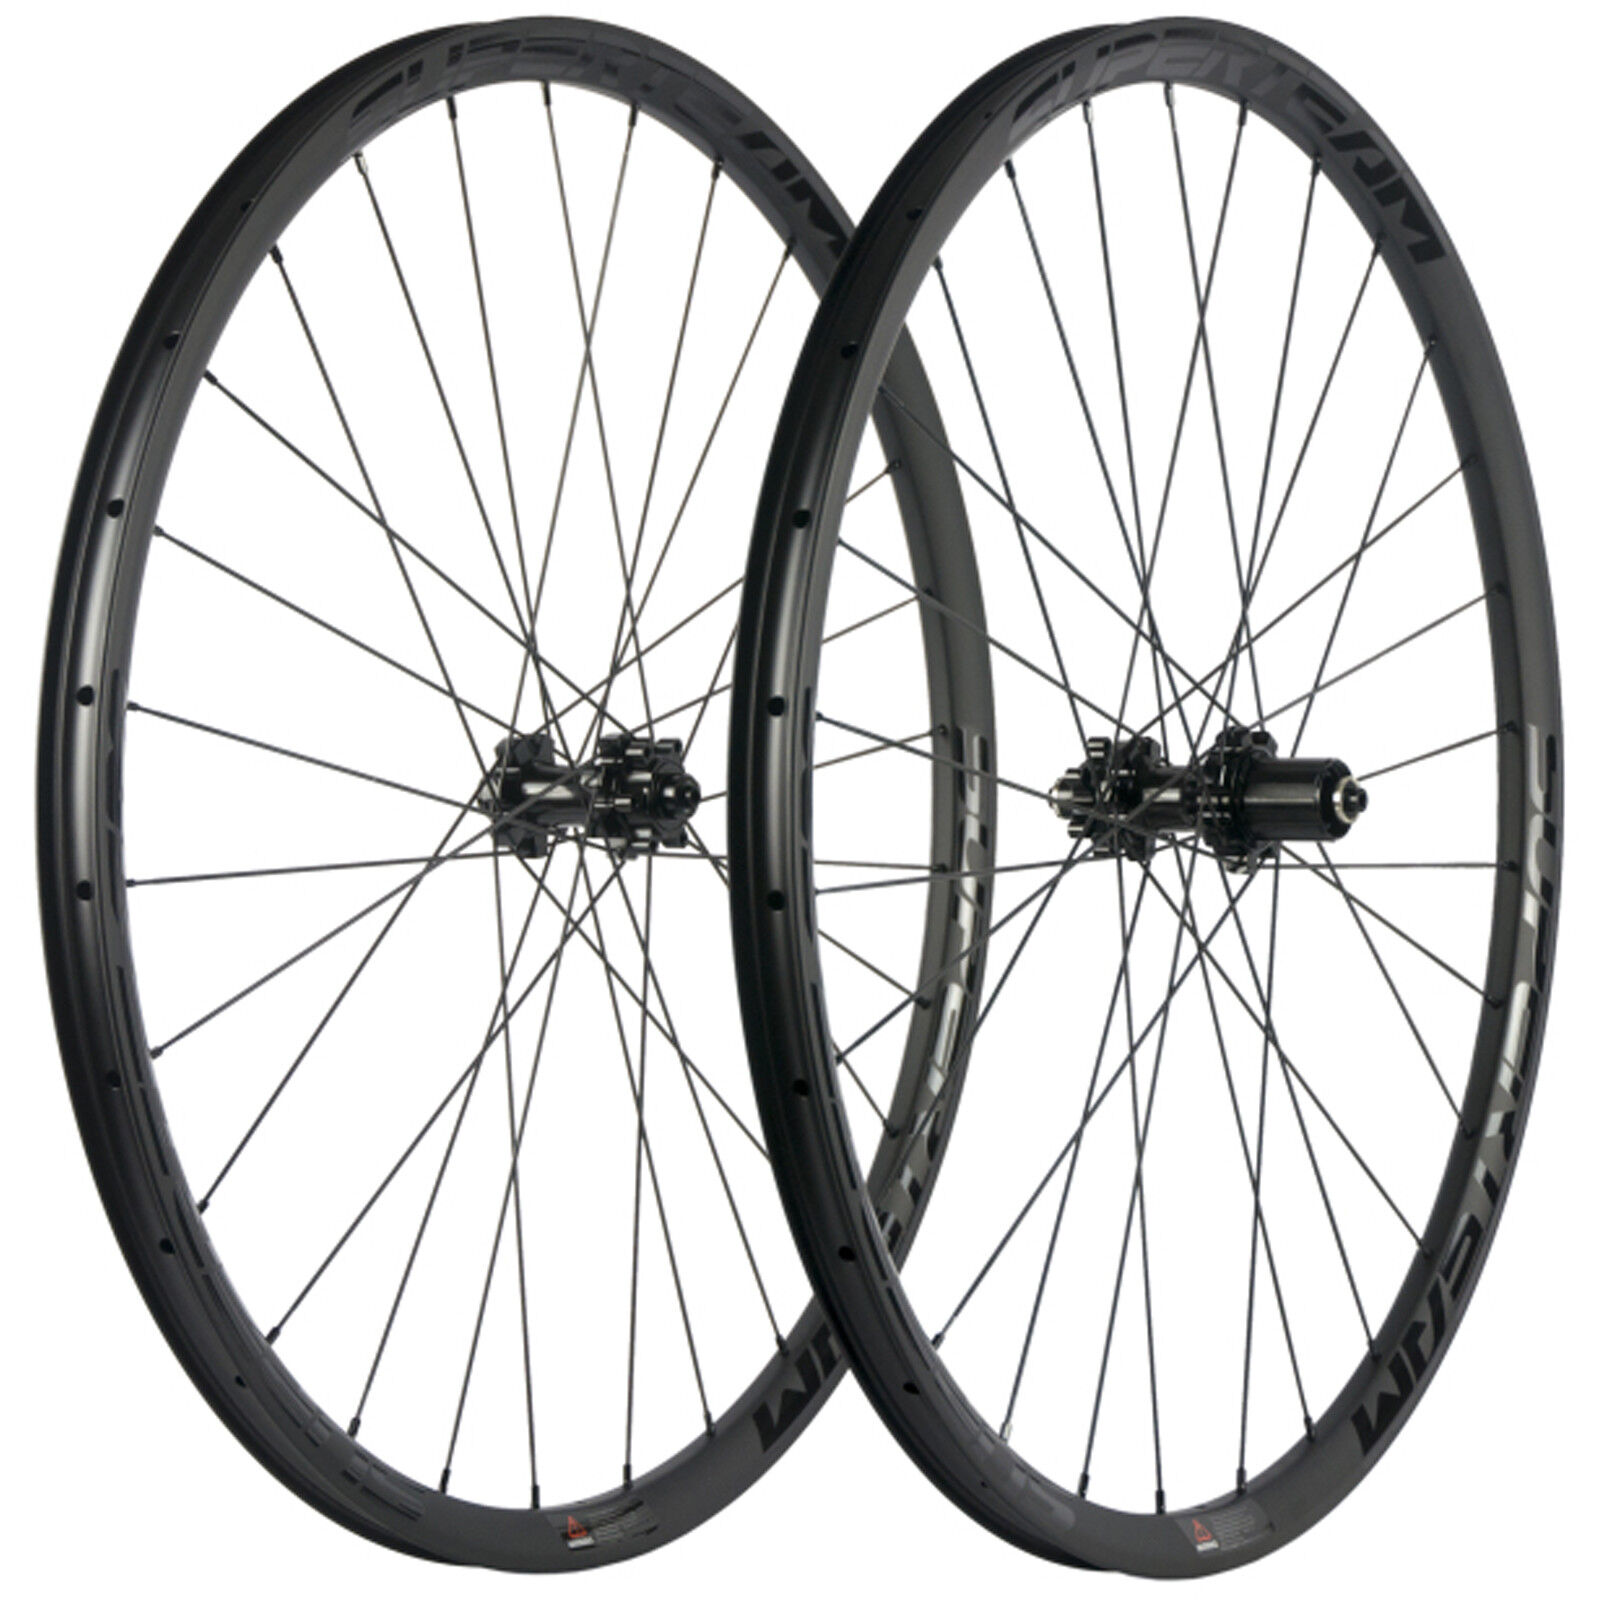 Superteam 29er 30mm Wide  25mm Deep Mountain Carbon Wheelset Tubeless MTB UD Rims  healthy